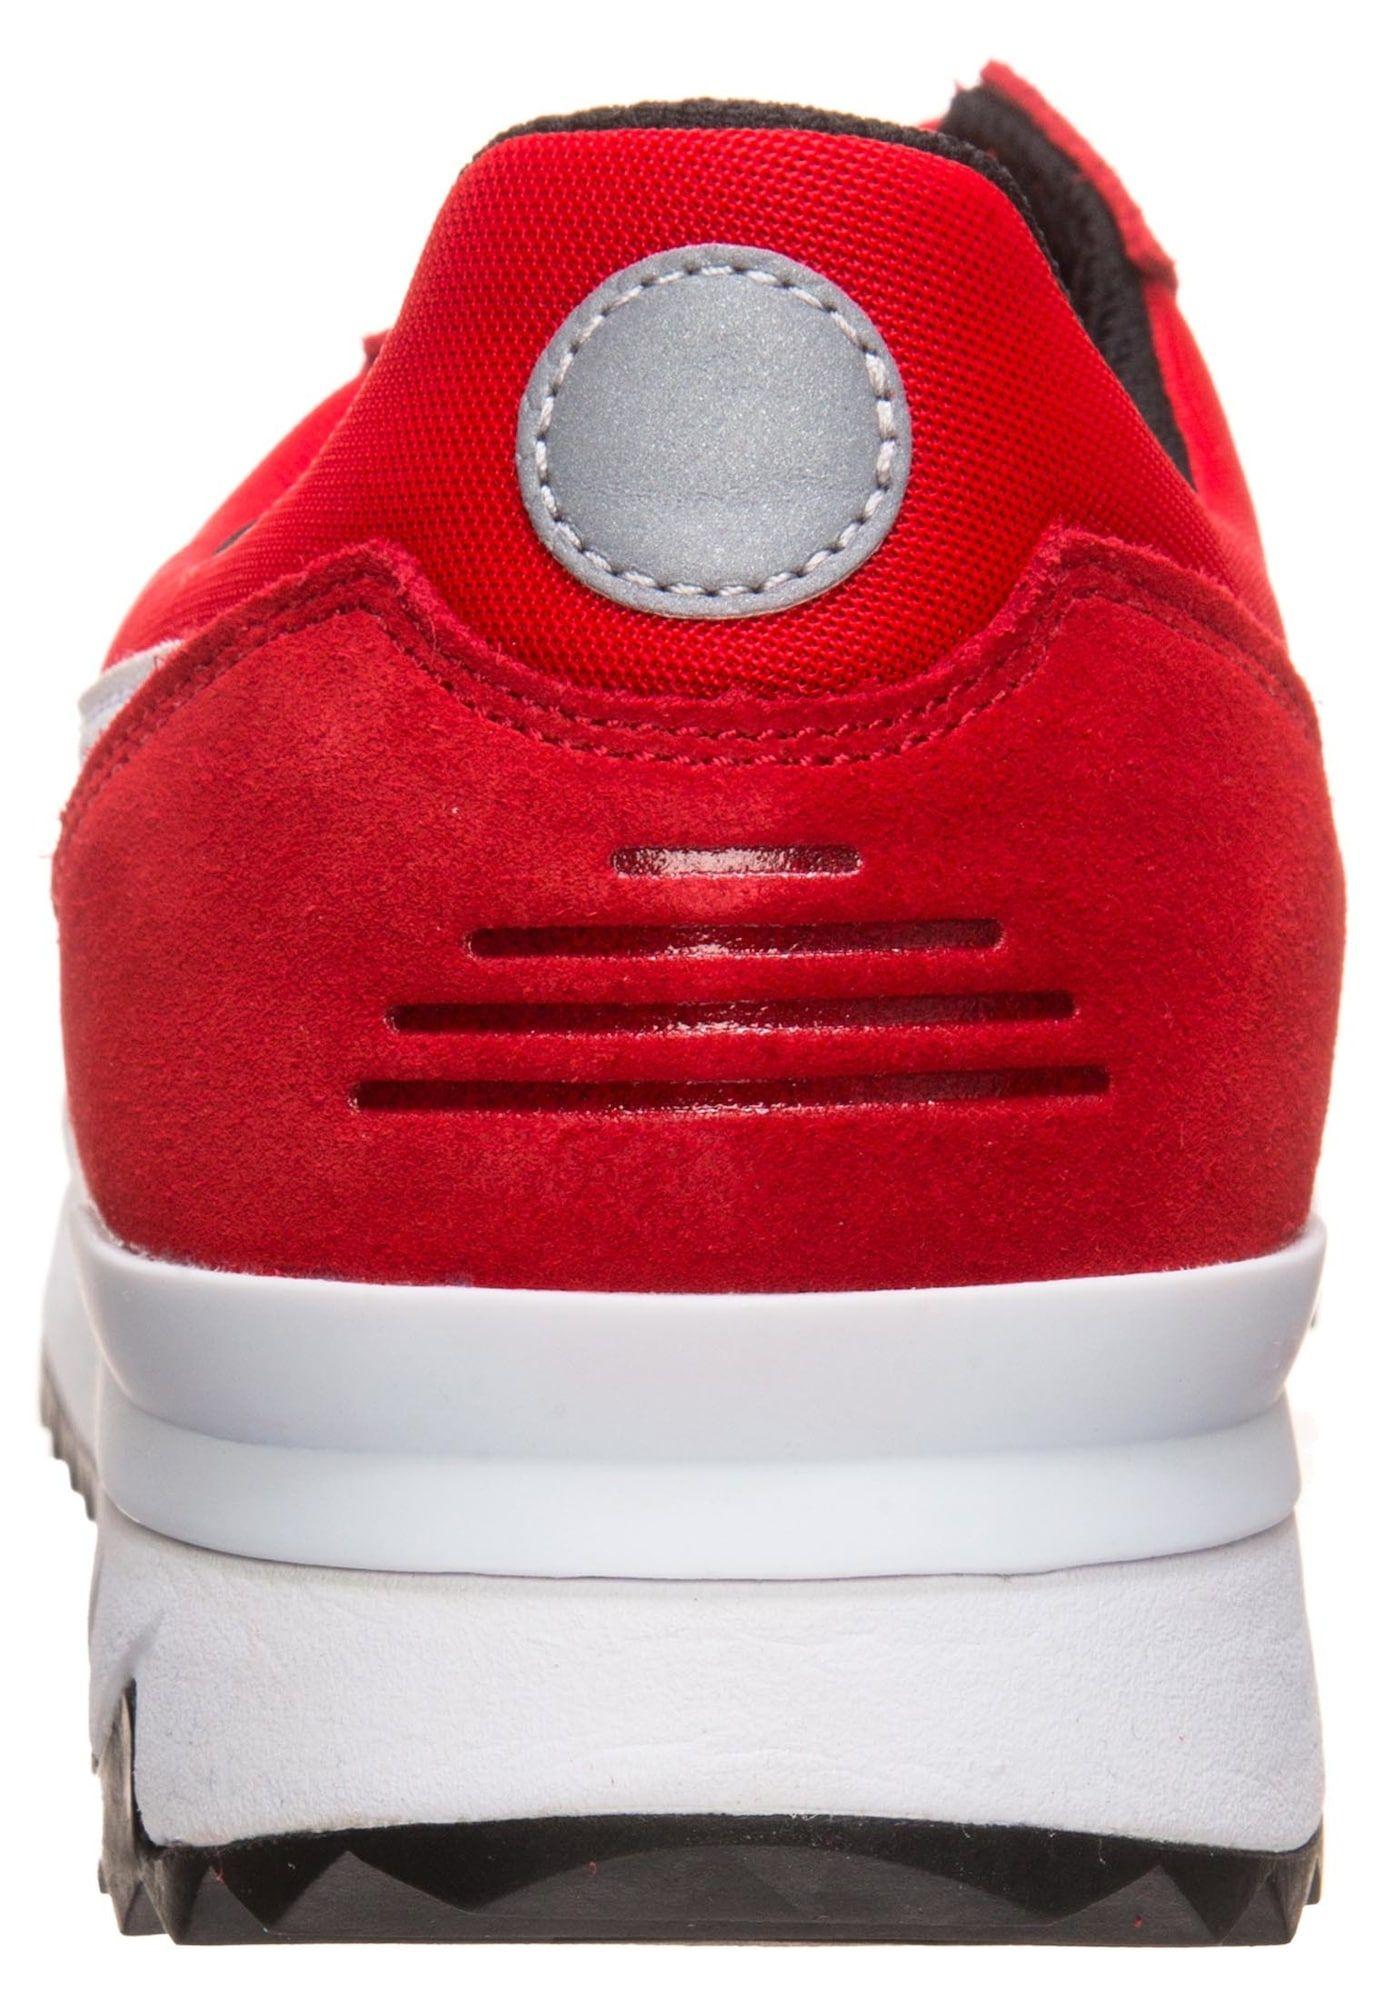 Onitsuka Tiger Sneaker 'California 78 Ex' Herren, Rot